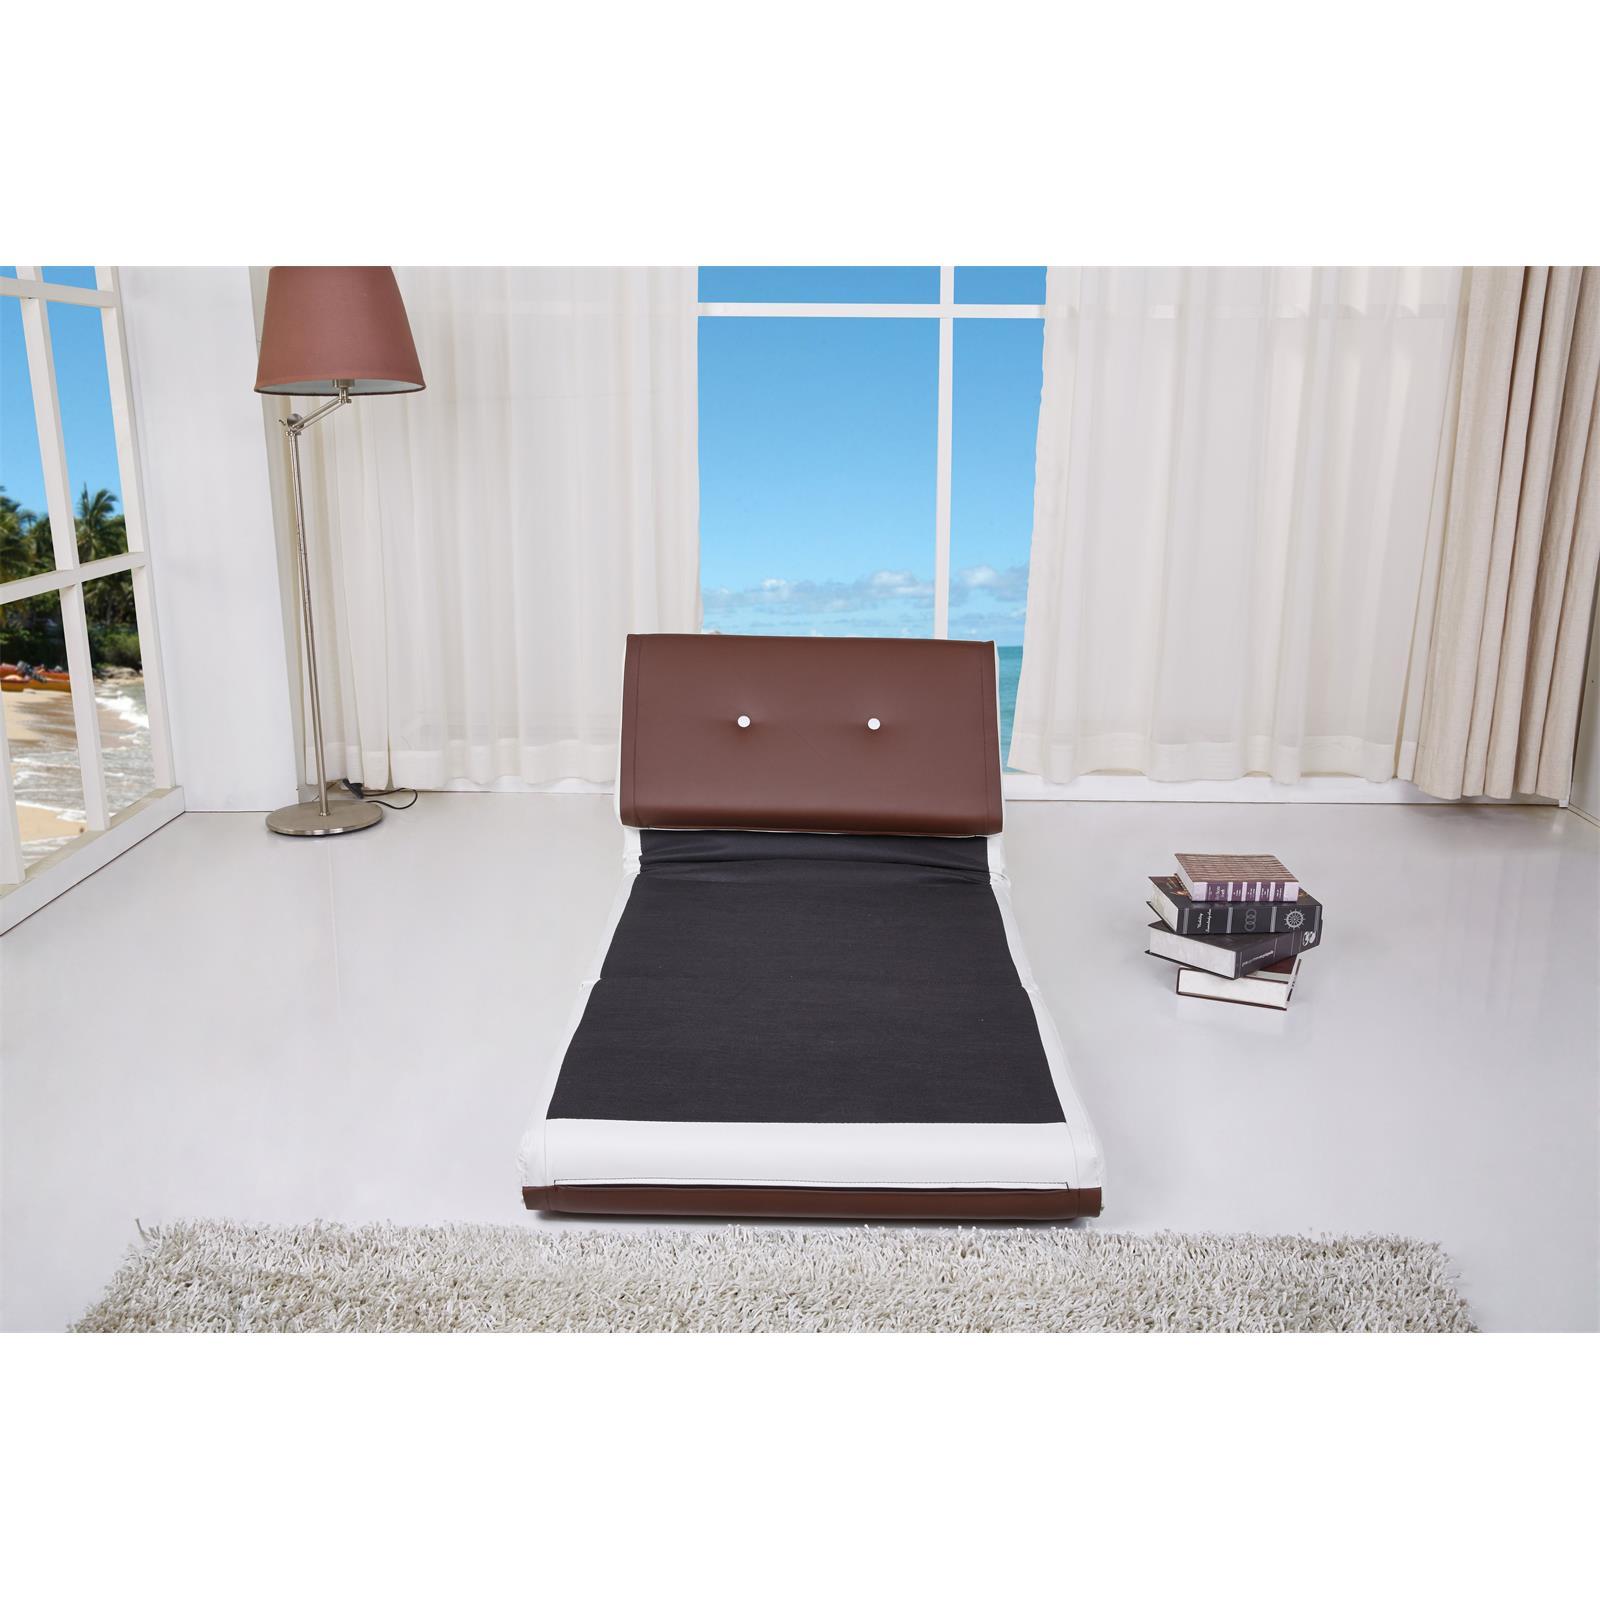 schlafsessel sofaliege design jugend bett braun weiss kunstleder modern g ste ebay. Black Bedroom Furniture Sets. Home Design Ideas